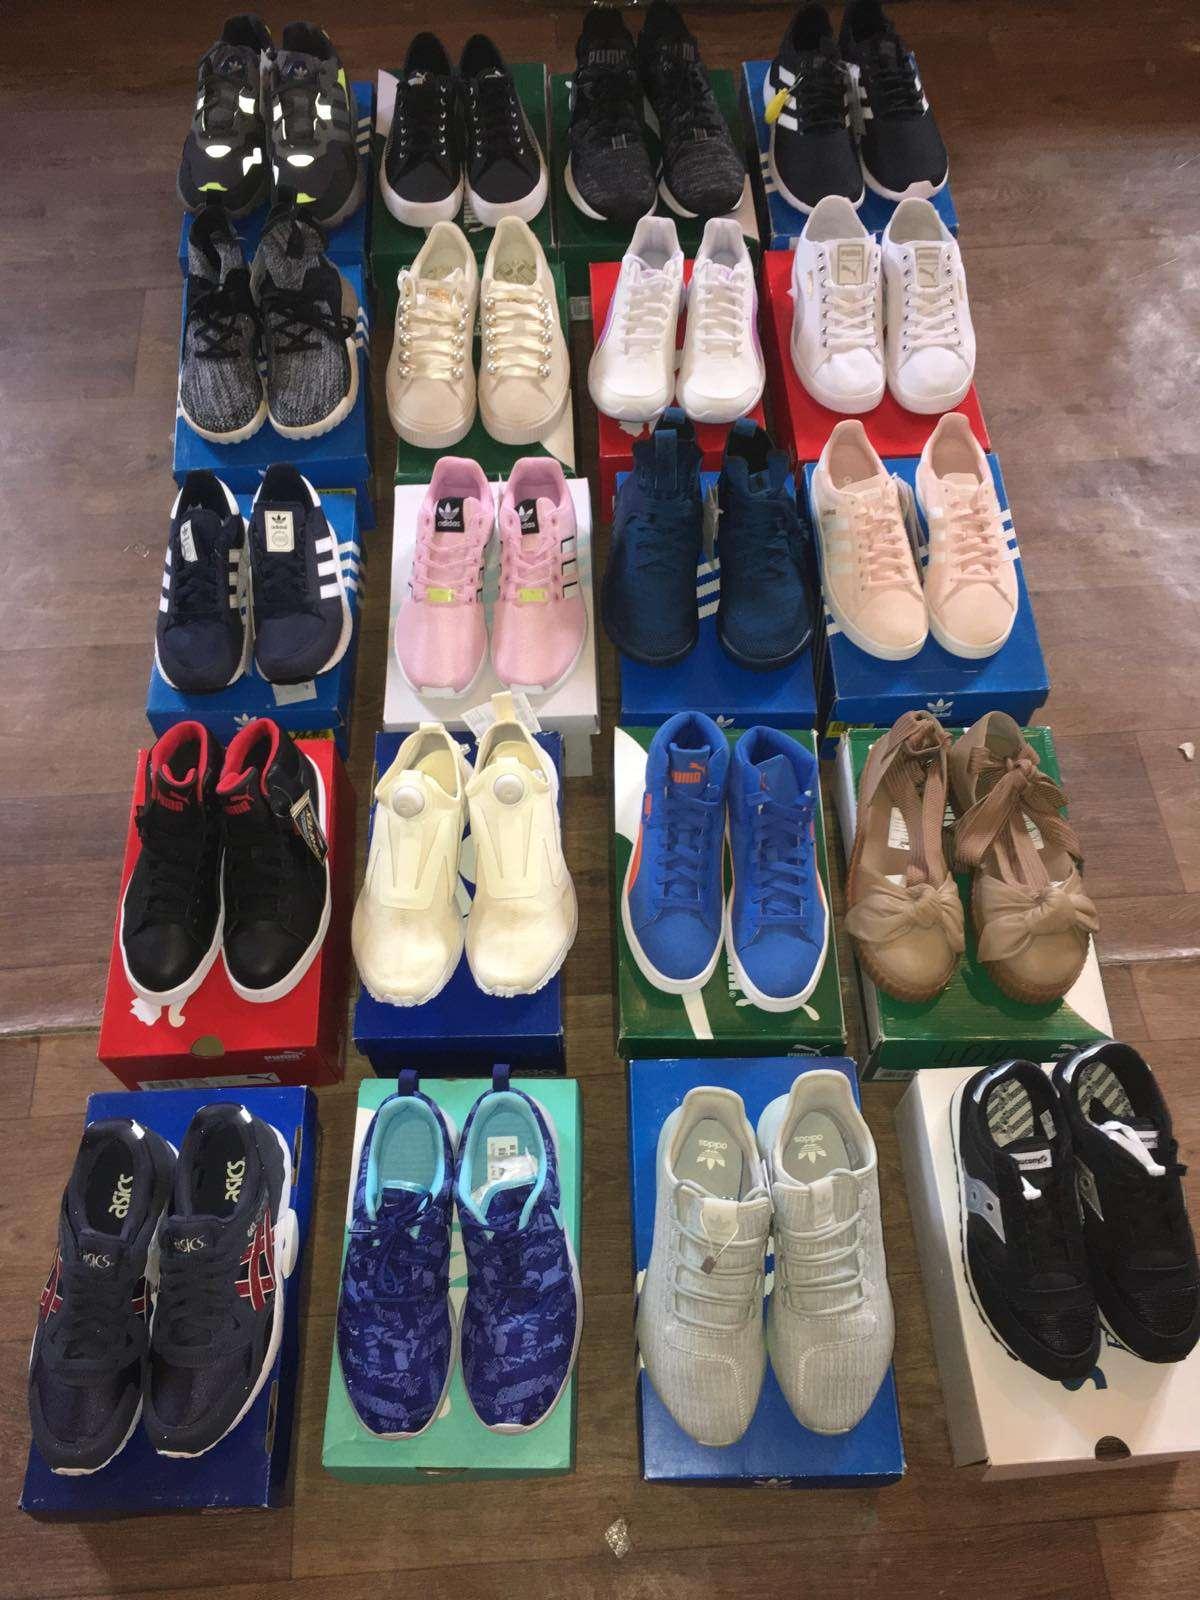 Сток спортивной обуви Nike, Puma, Vans, Adidas, Asics фото 3